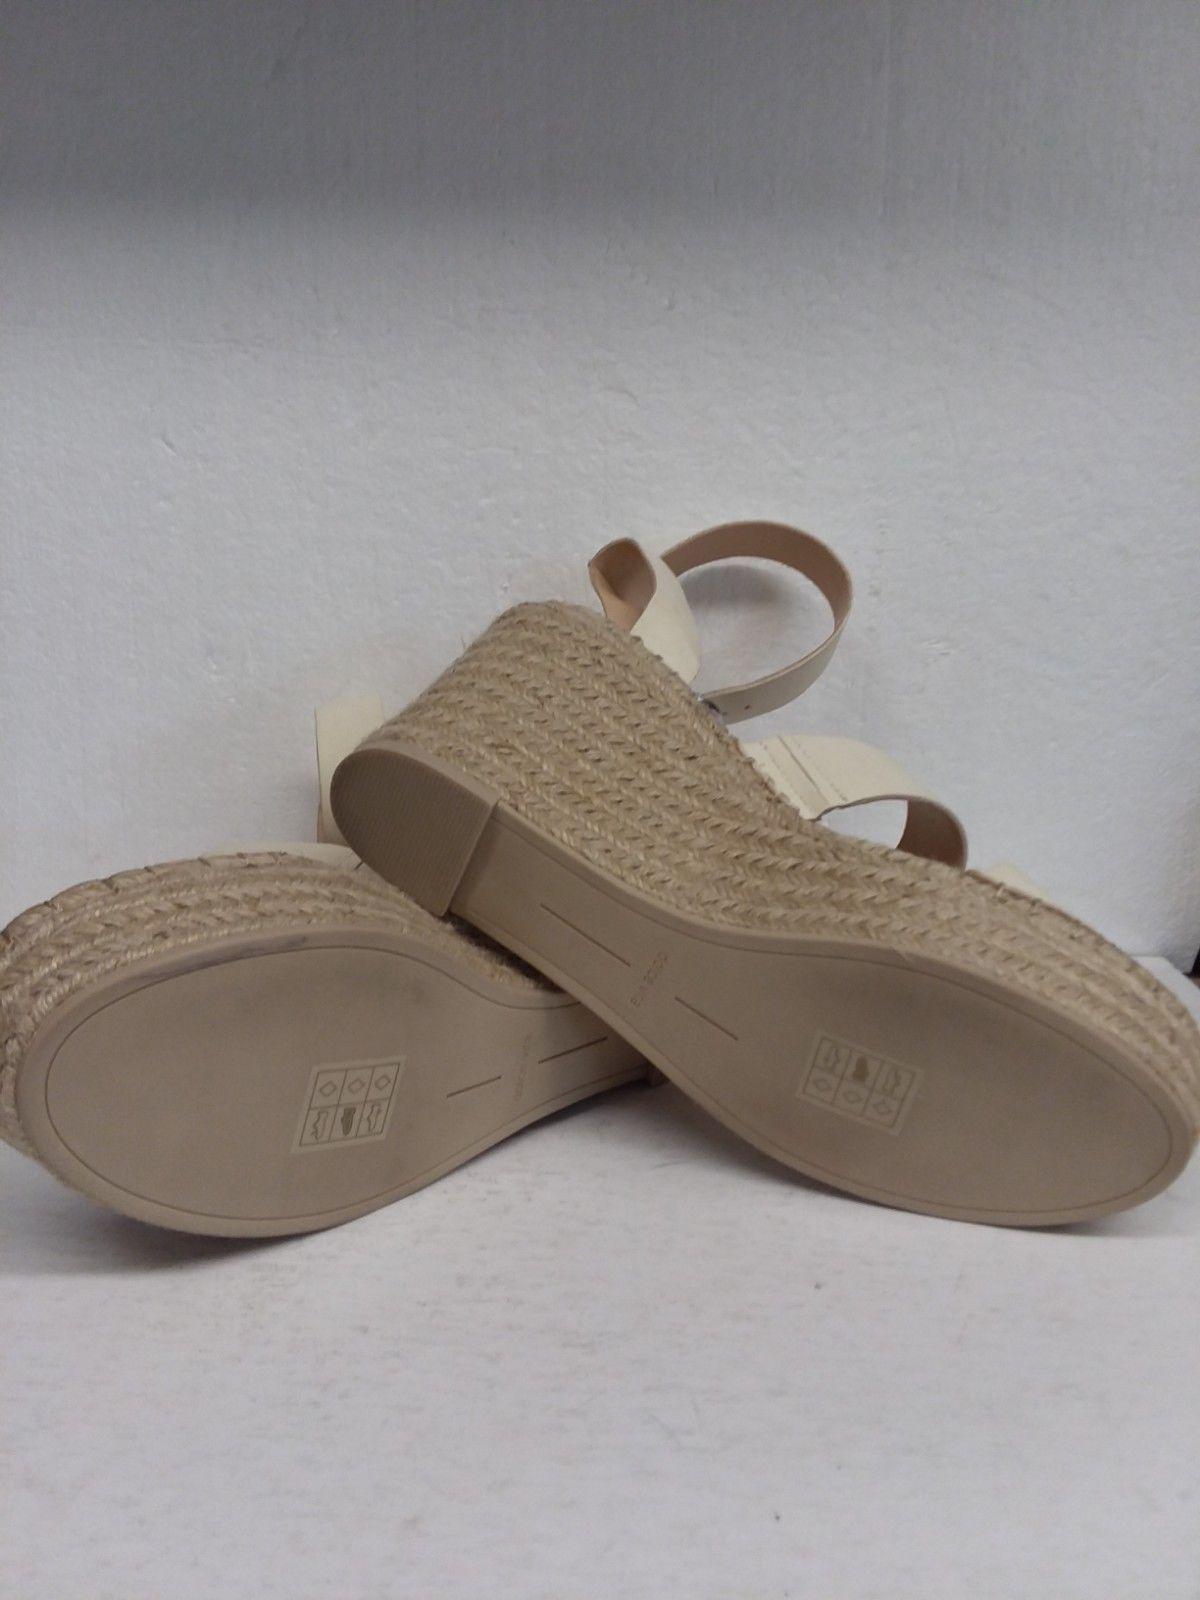 Dolce Vita Women's White Stella Leather Wedge Sandals Size 9.5